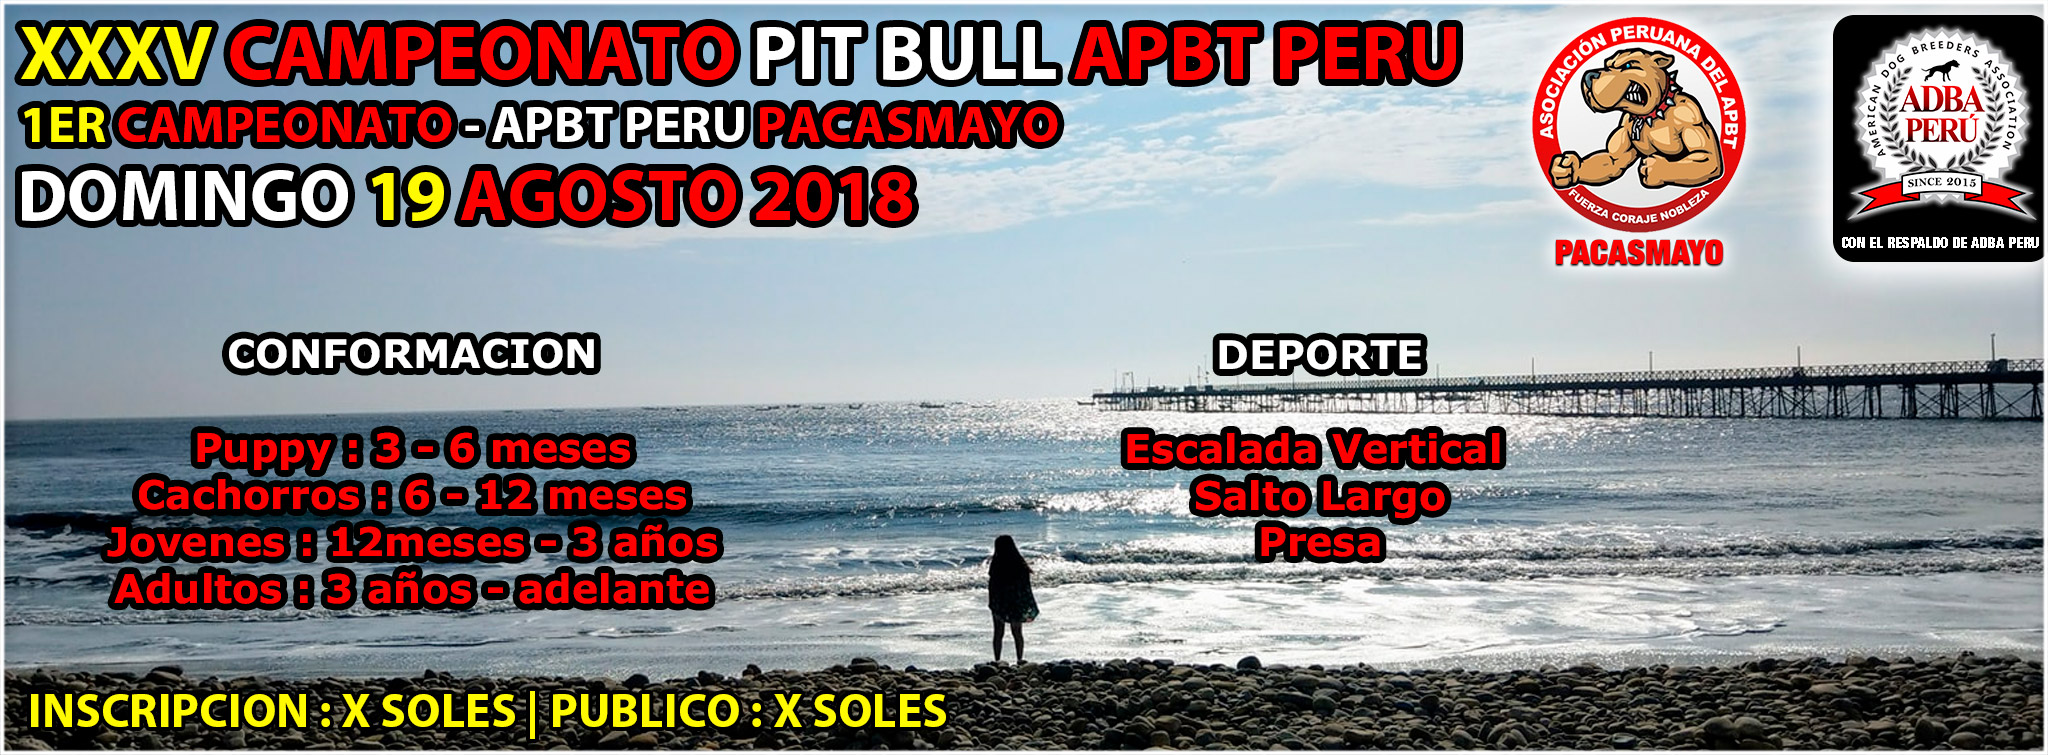 XXXV Campeonato Apbt Peru – 1er Campeonato Apbt Peru – Pacasmayo